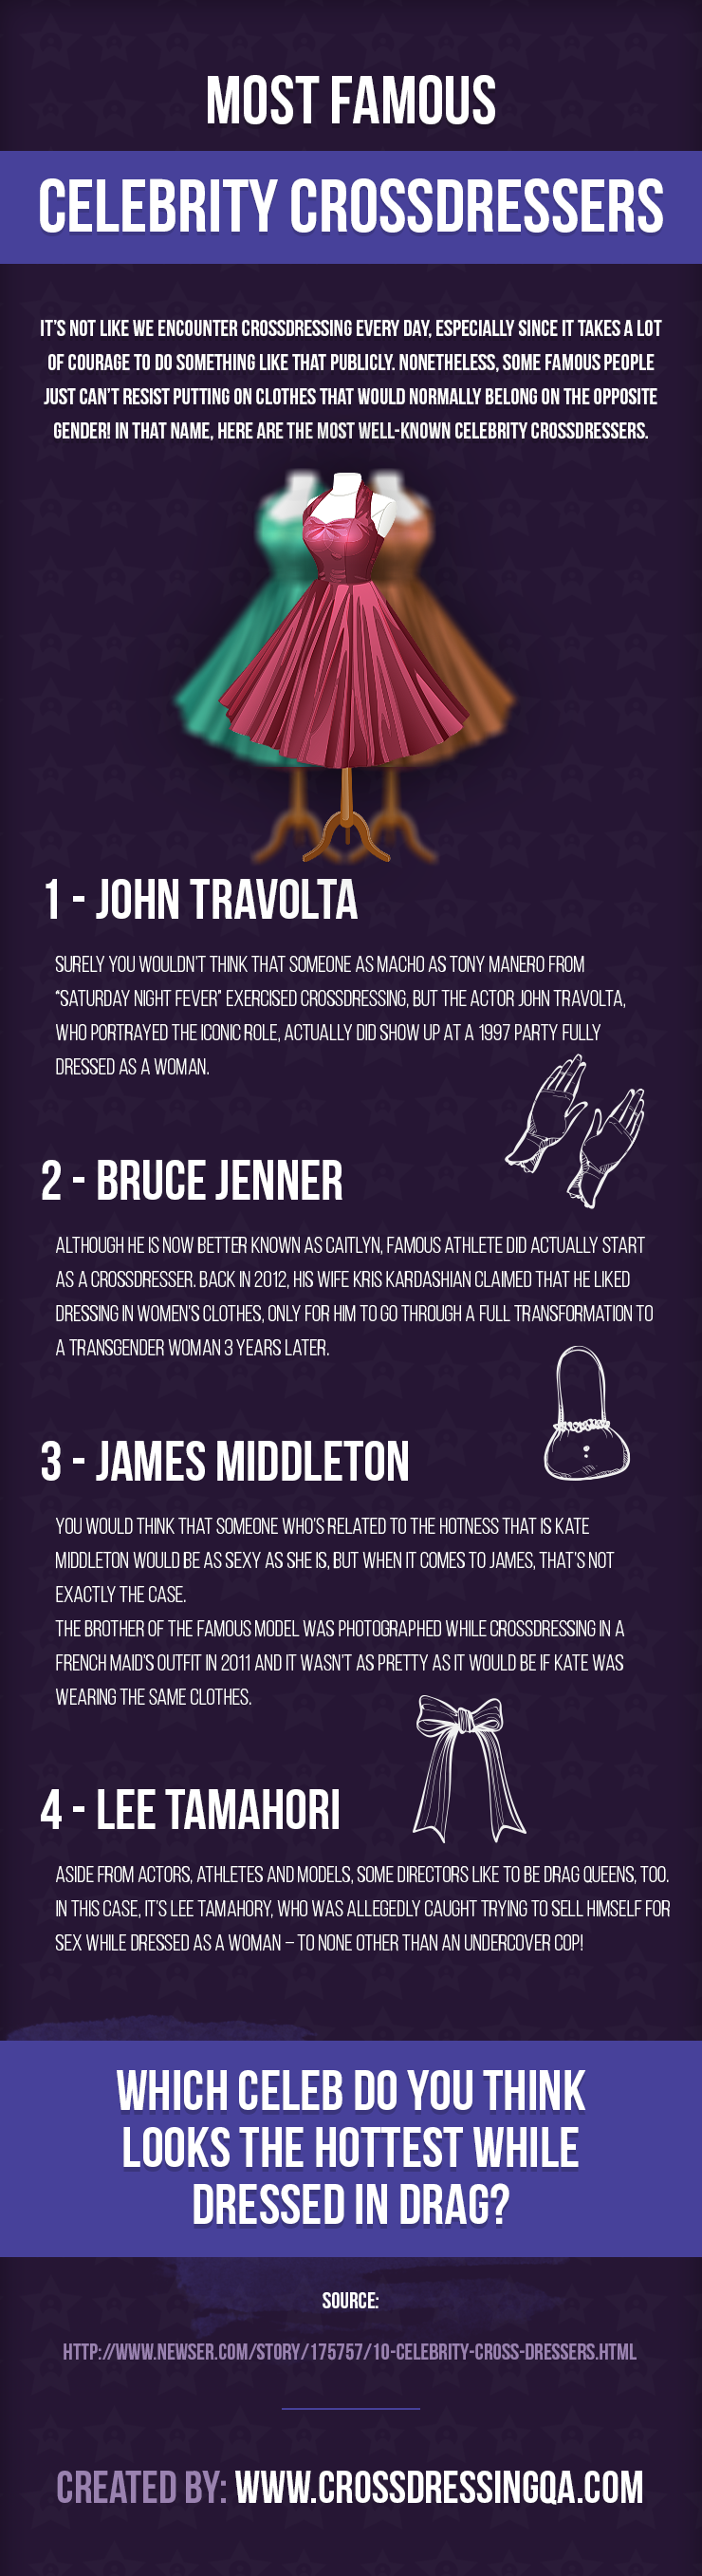 Most Famous Celebrity Crossdressers